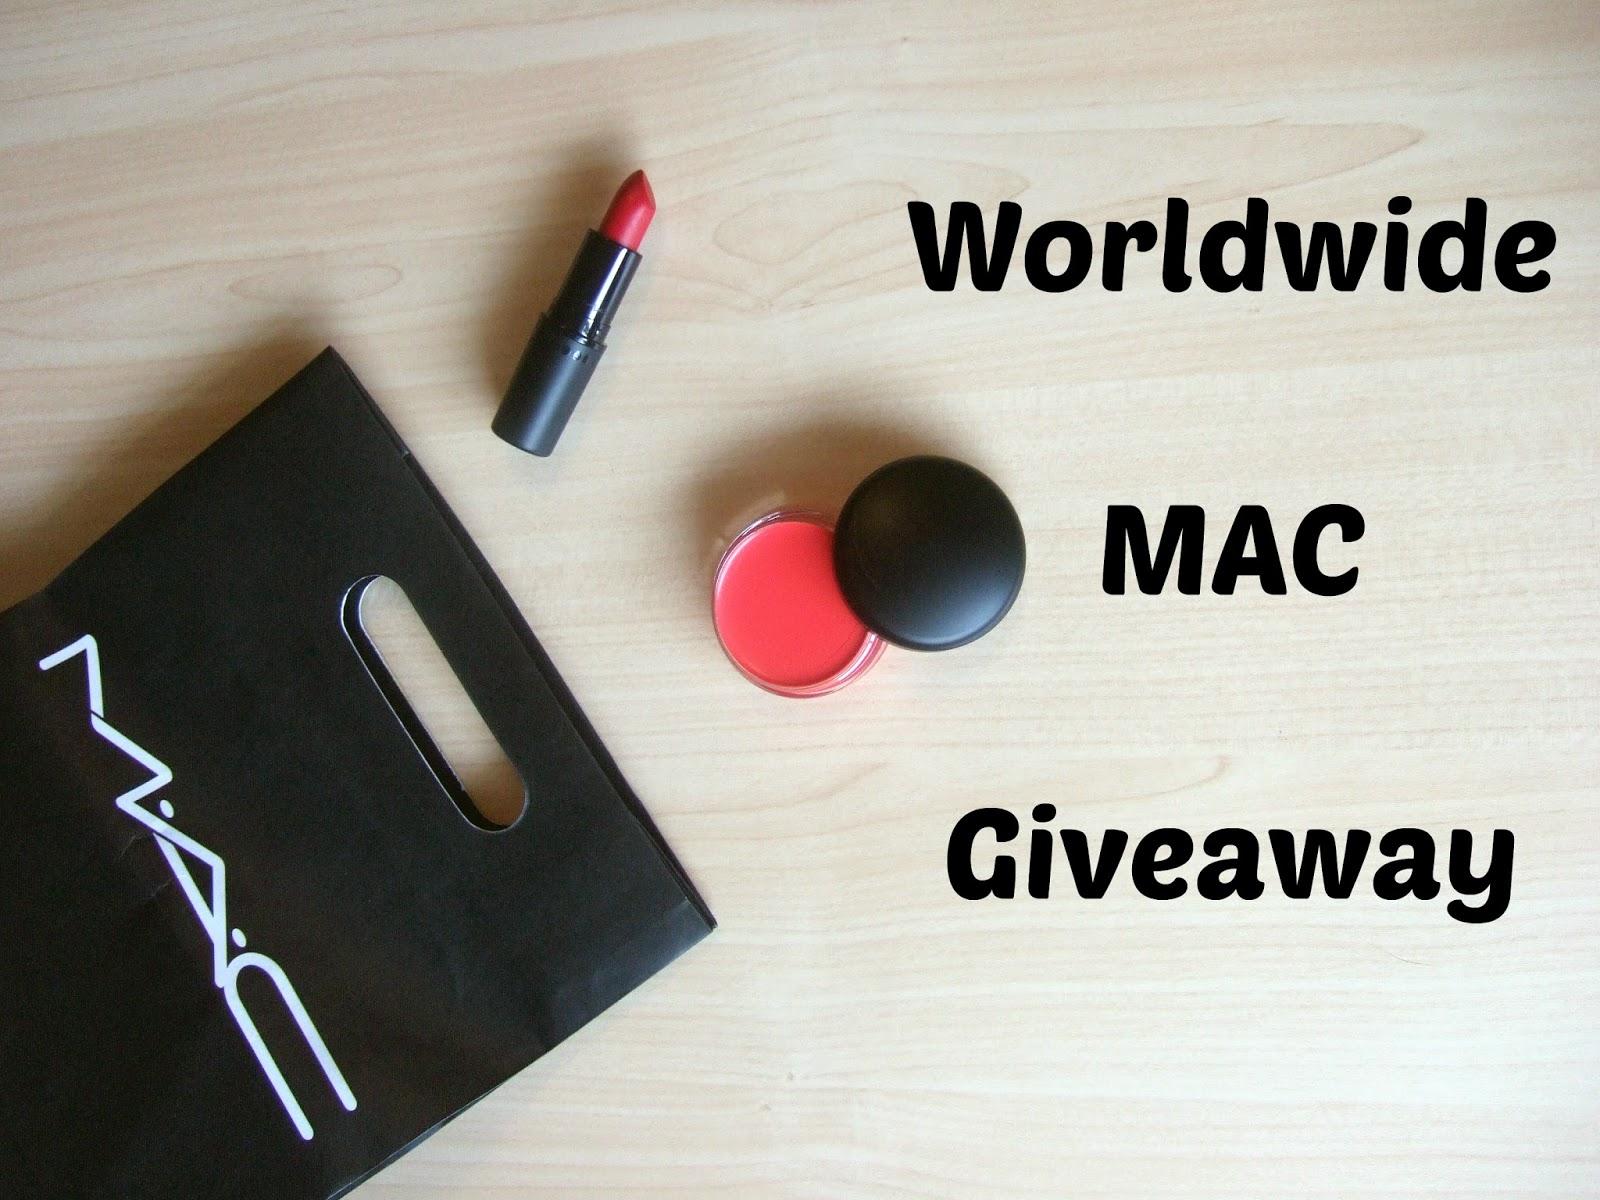 March MAC-ness: Worldwide MAC Giveaway #4